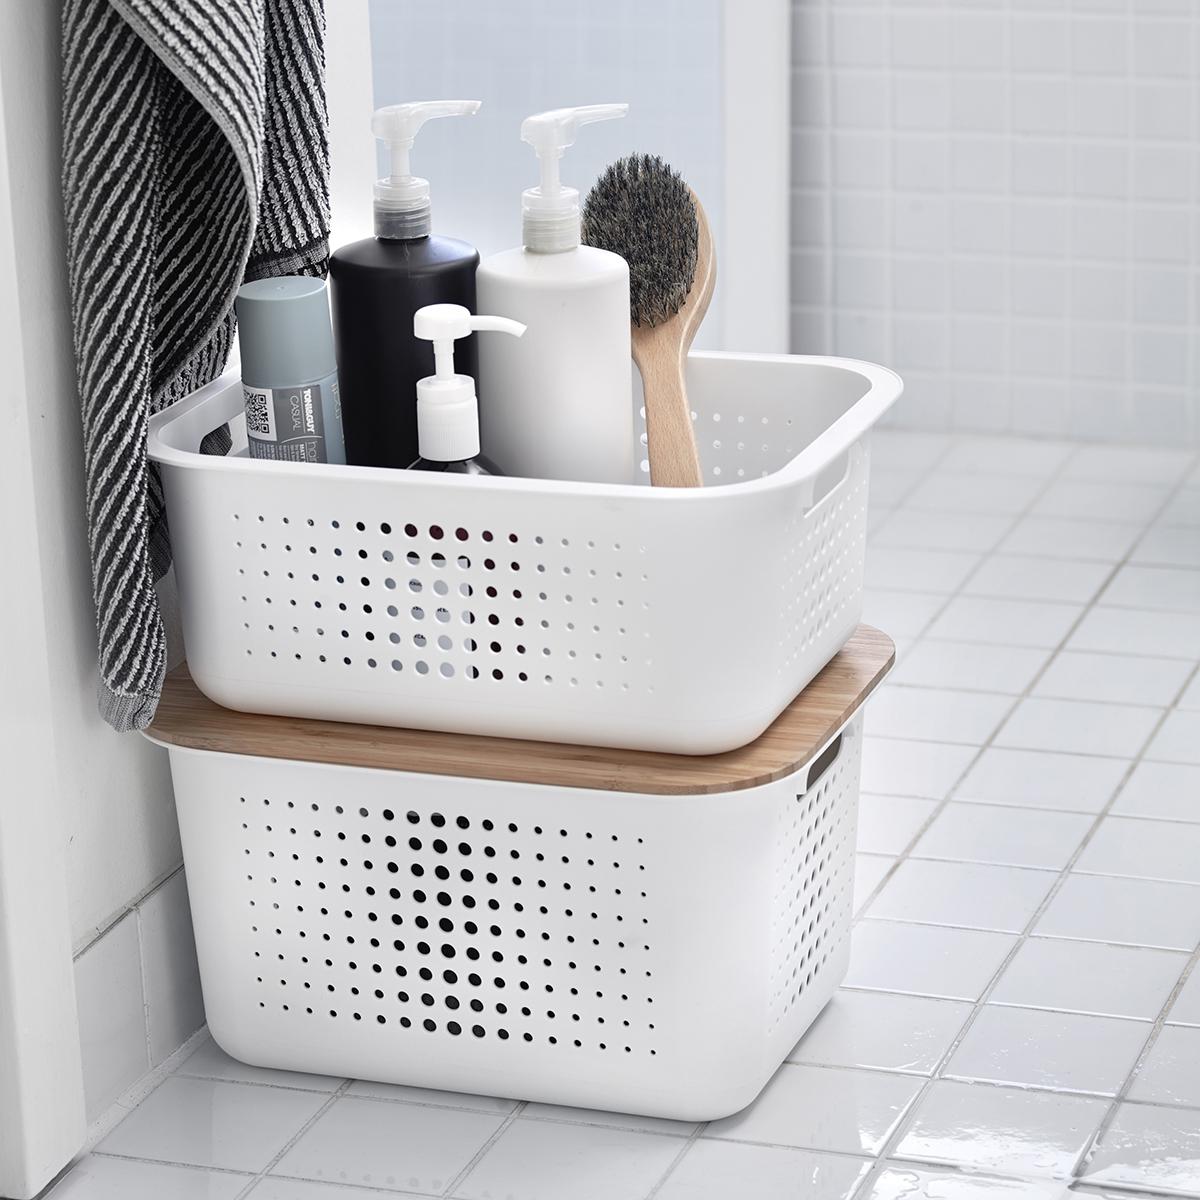 Under Sink Organizers Bathroom Cabinet Storage intended for size 1200 X 1200